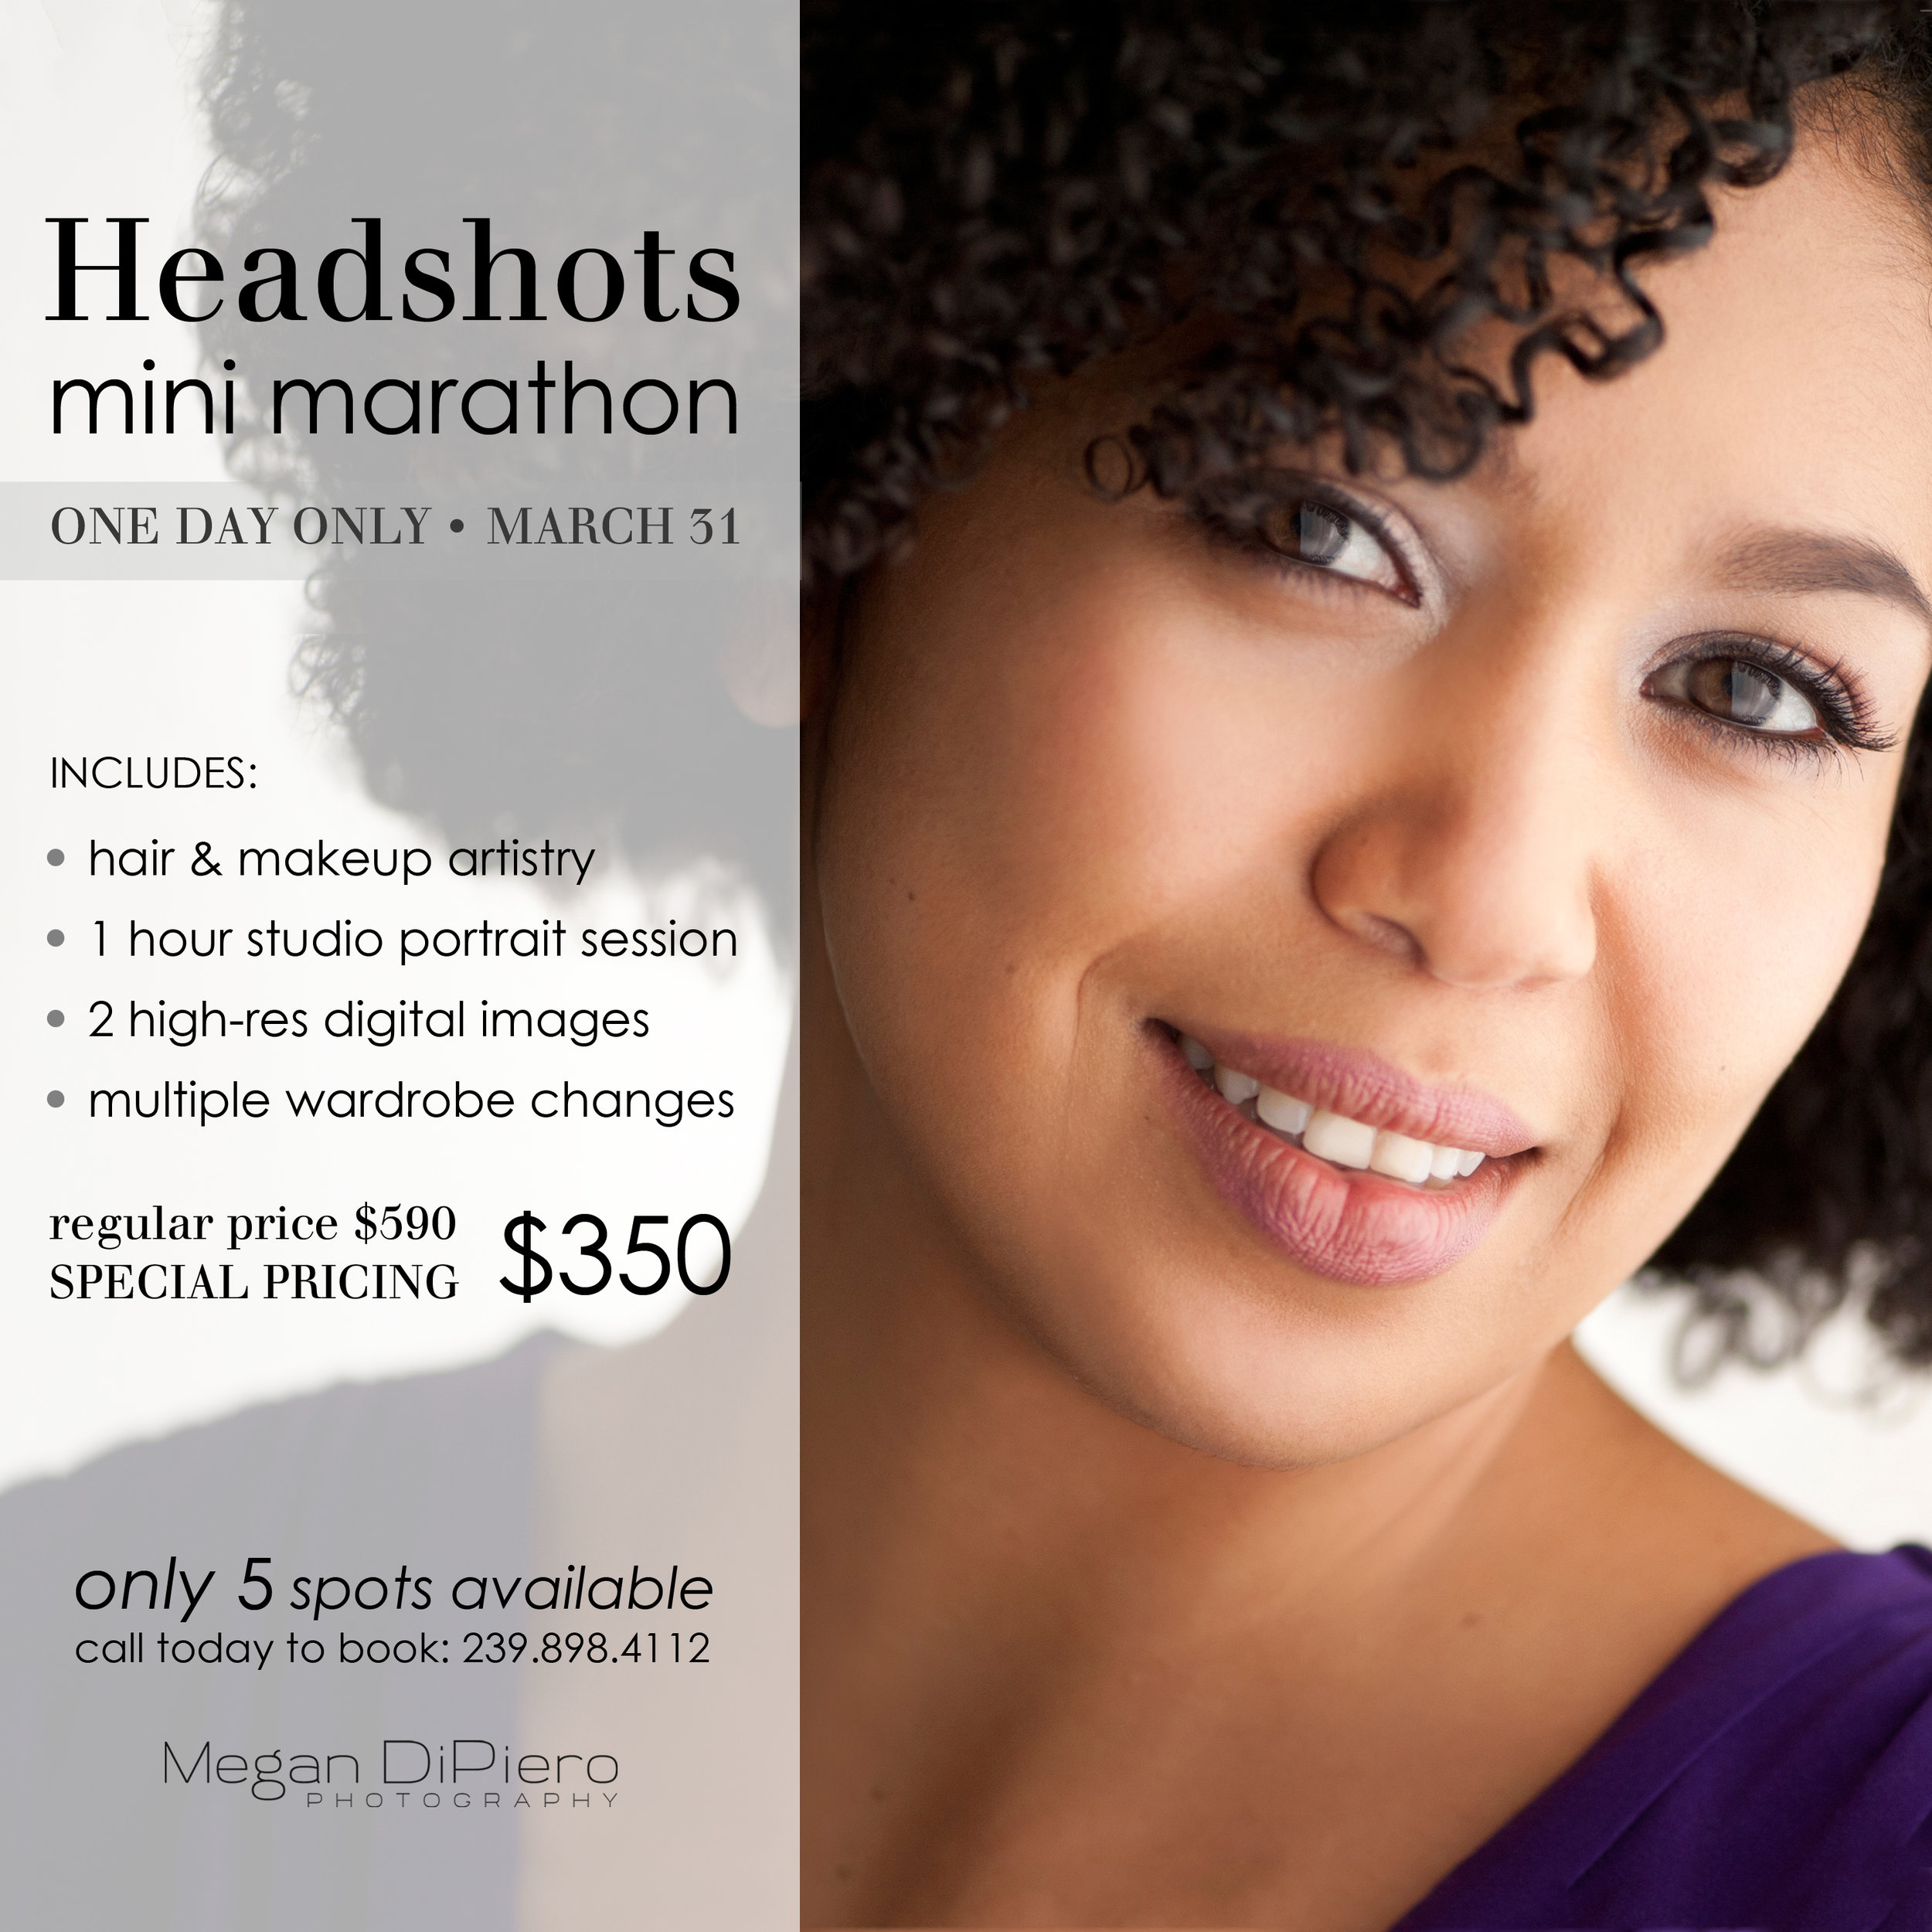 headshots-mini-marathon2.jpg